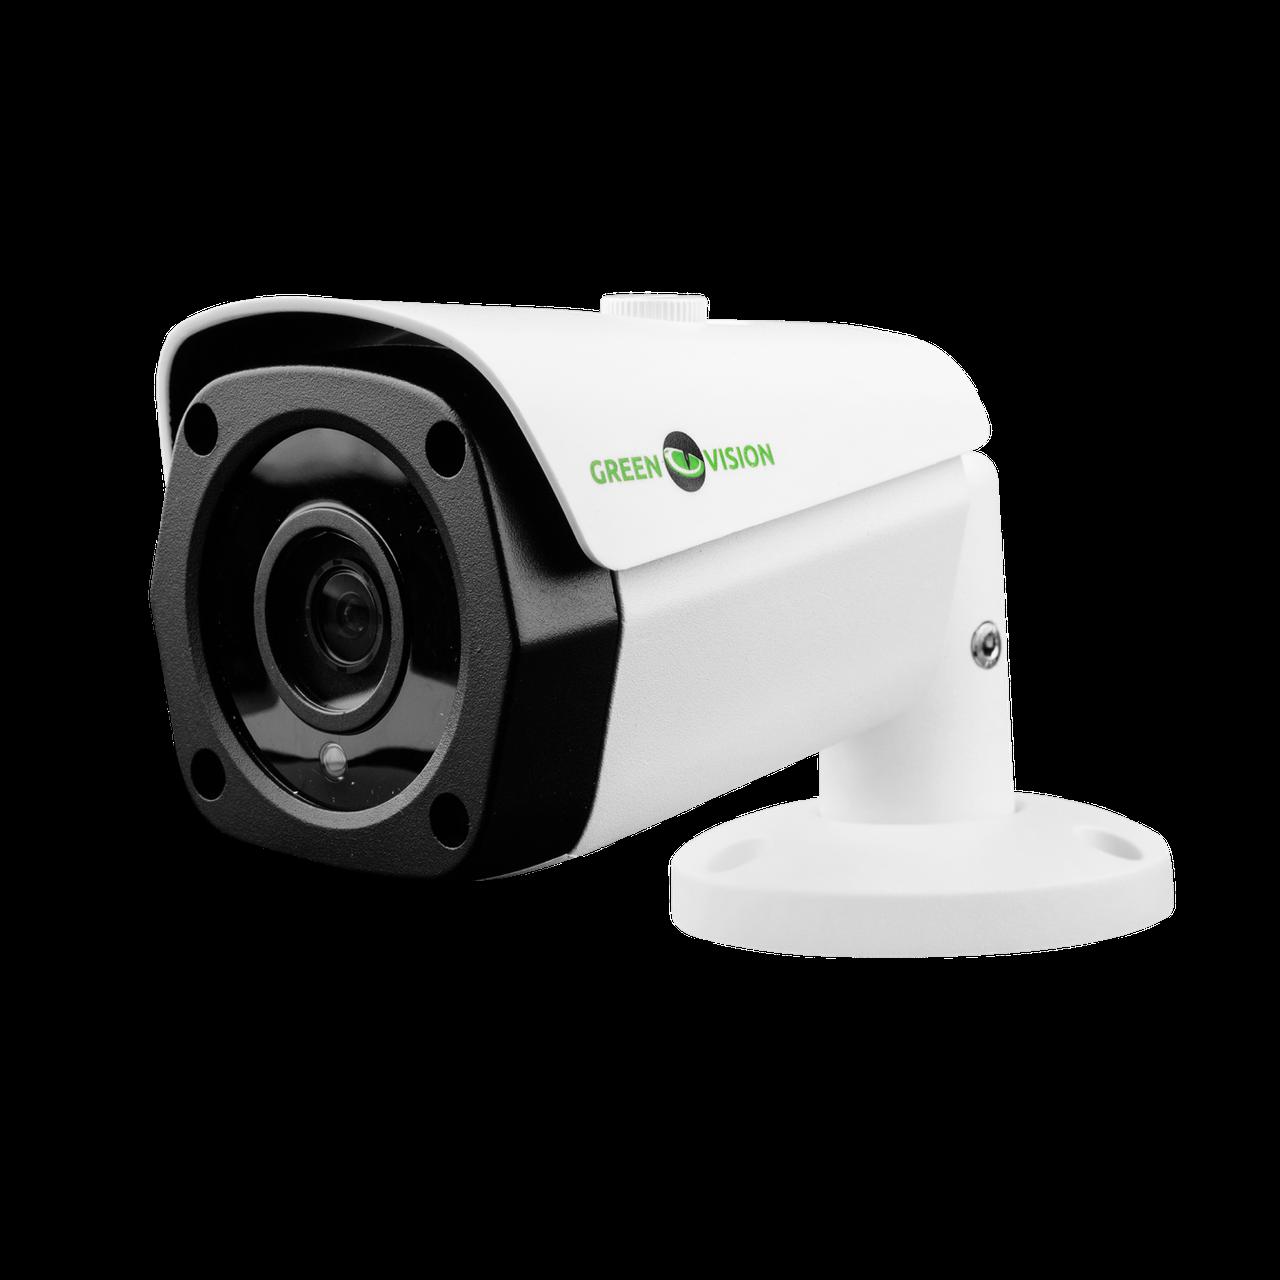 Зовнішня IP камера GreenVision GV-078-IP-E-COF20-20 POE